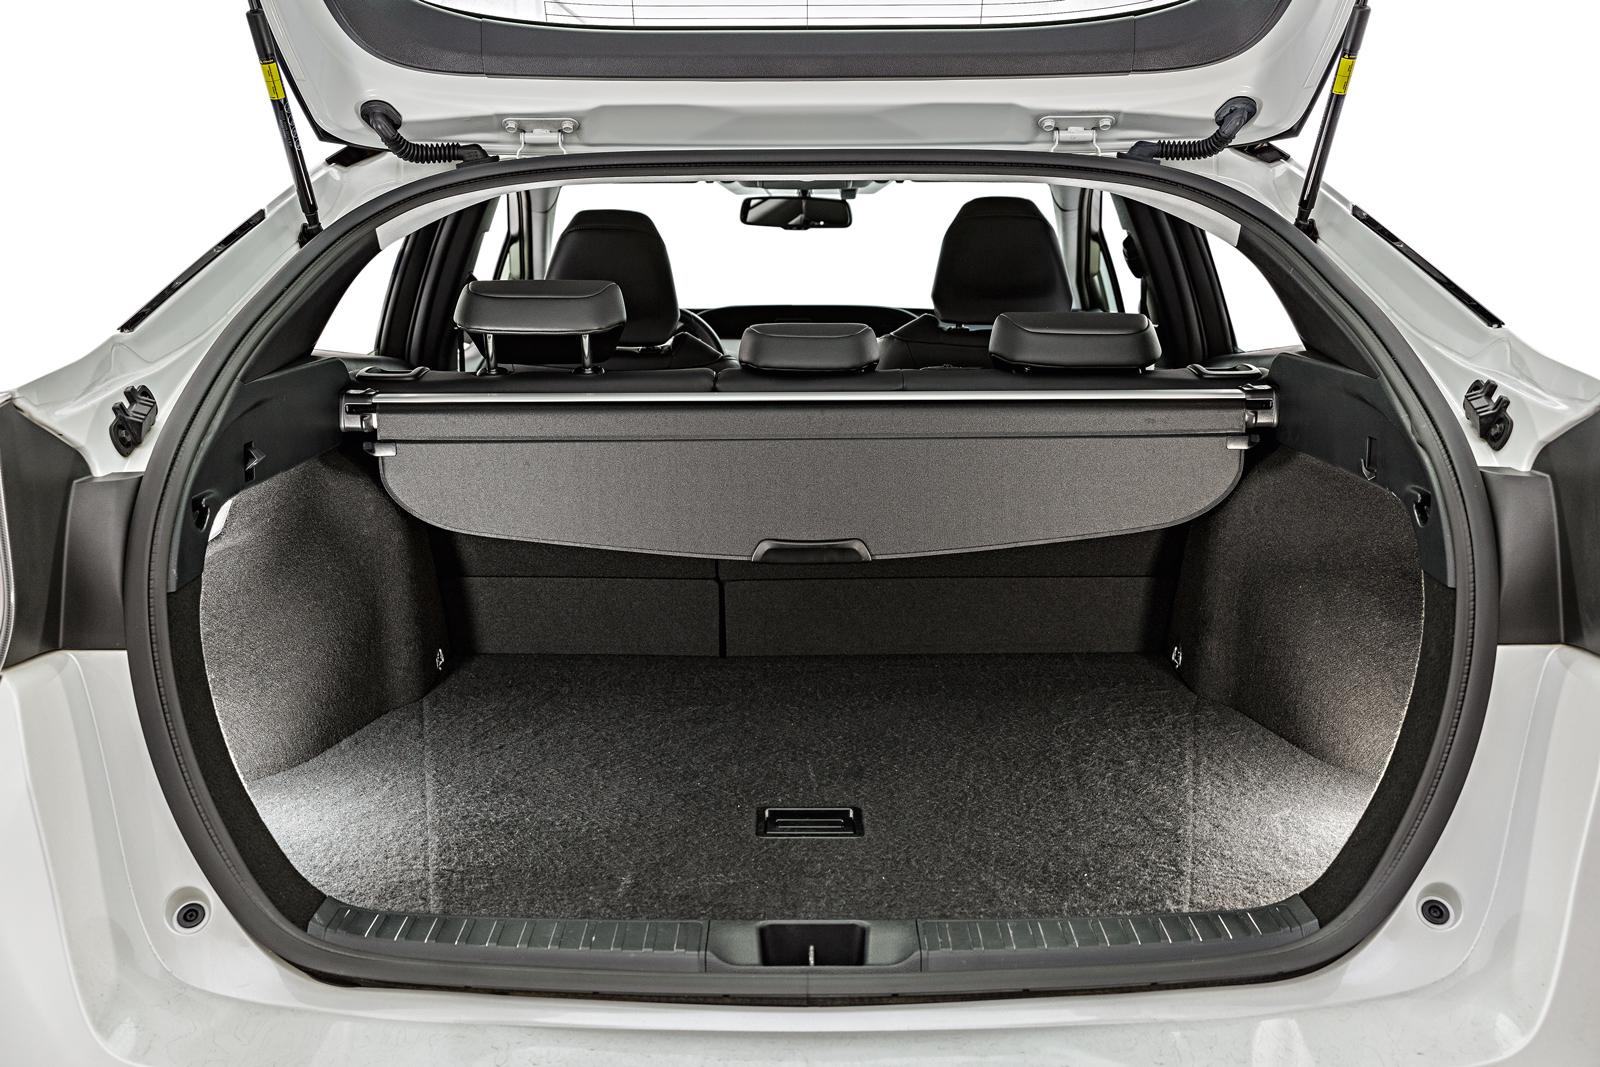 Porta-malas do Prius, de 412 litros, tem vidro integrado à tampa